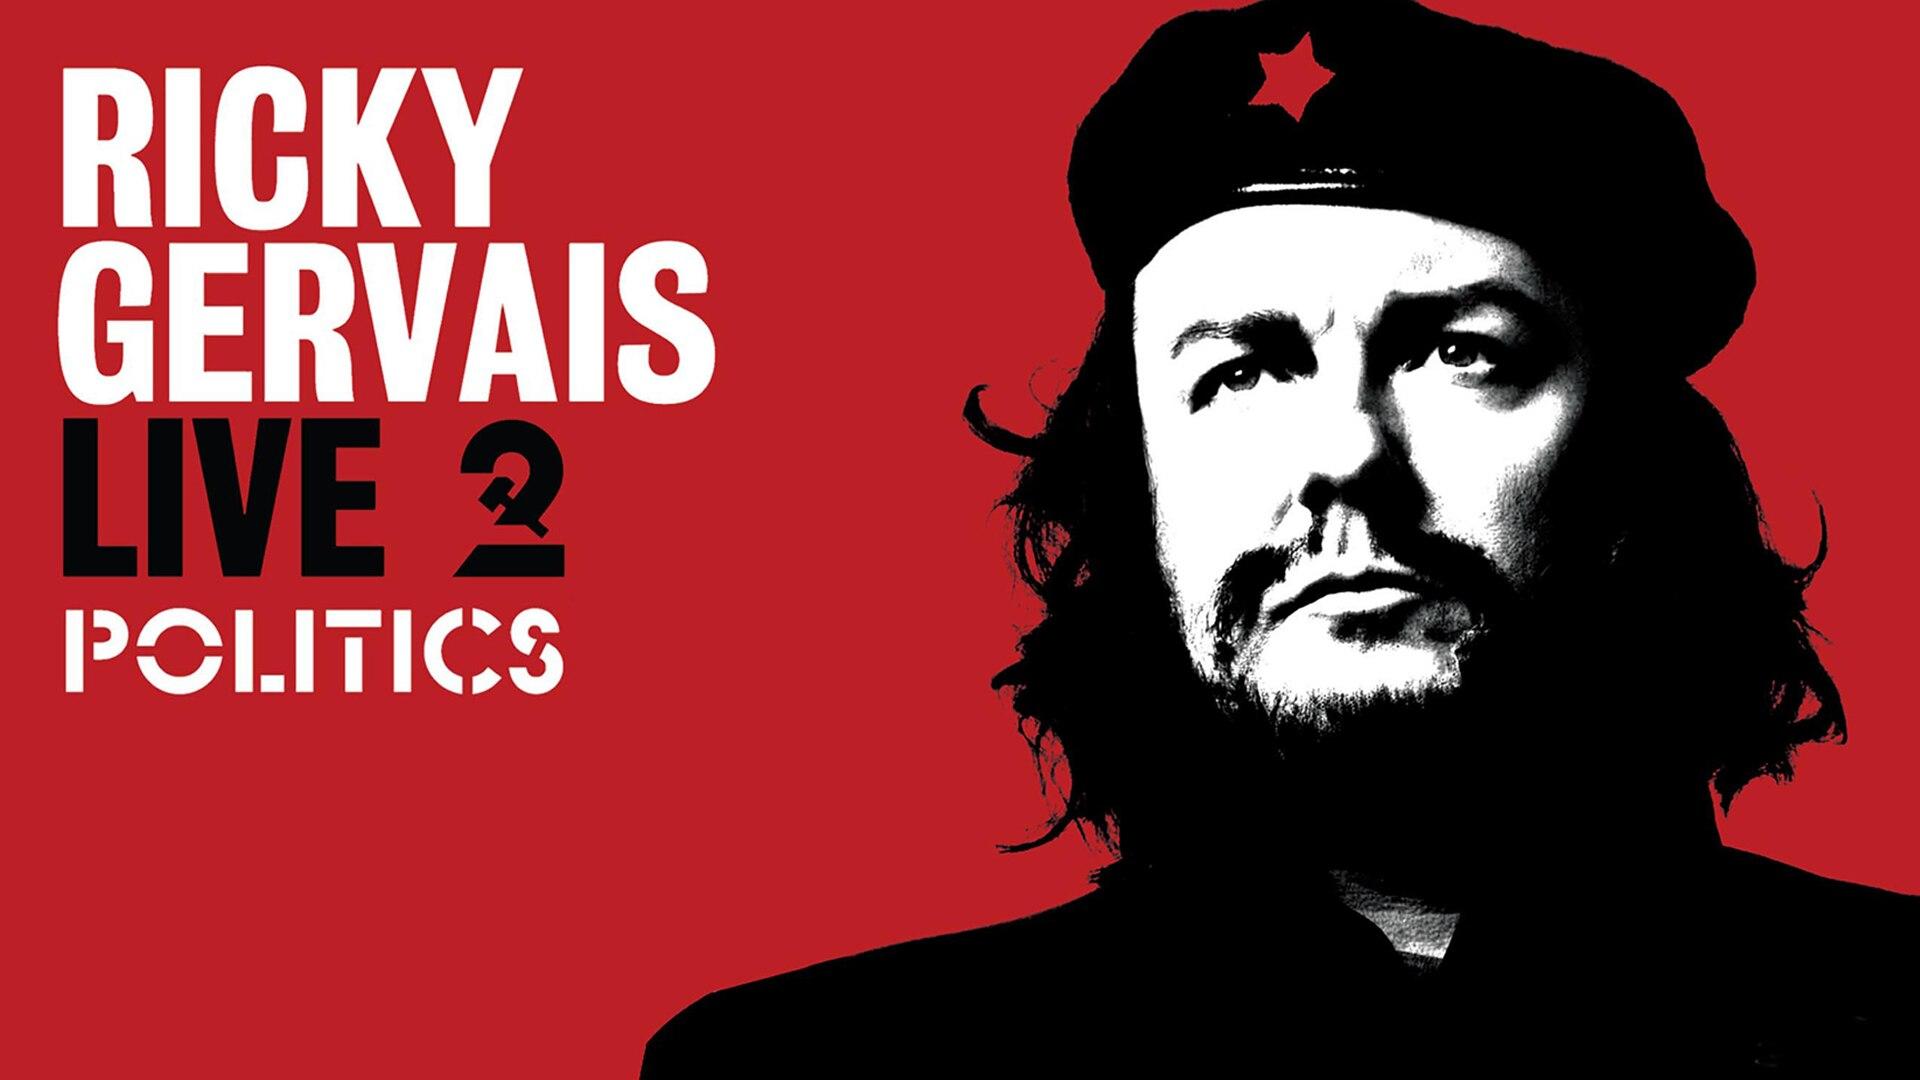 Ricky Gervais Live Politics